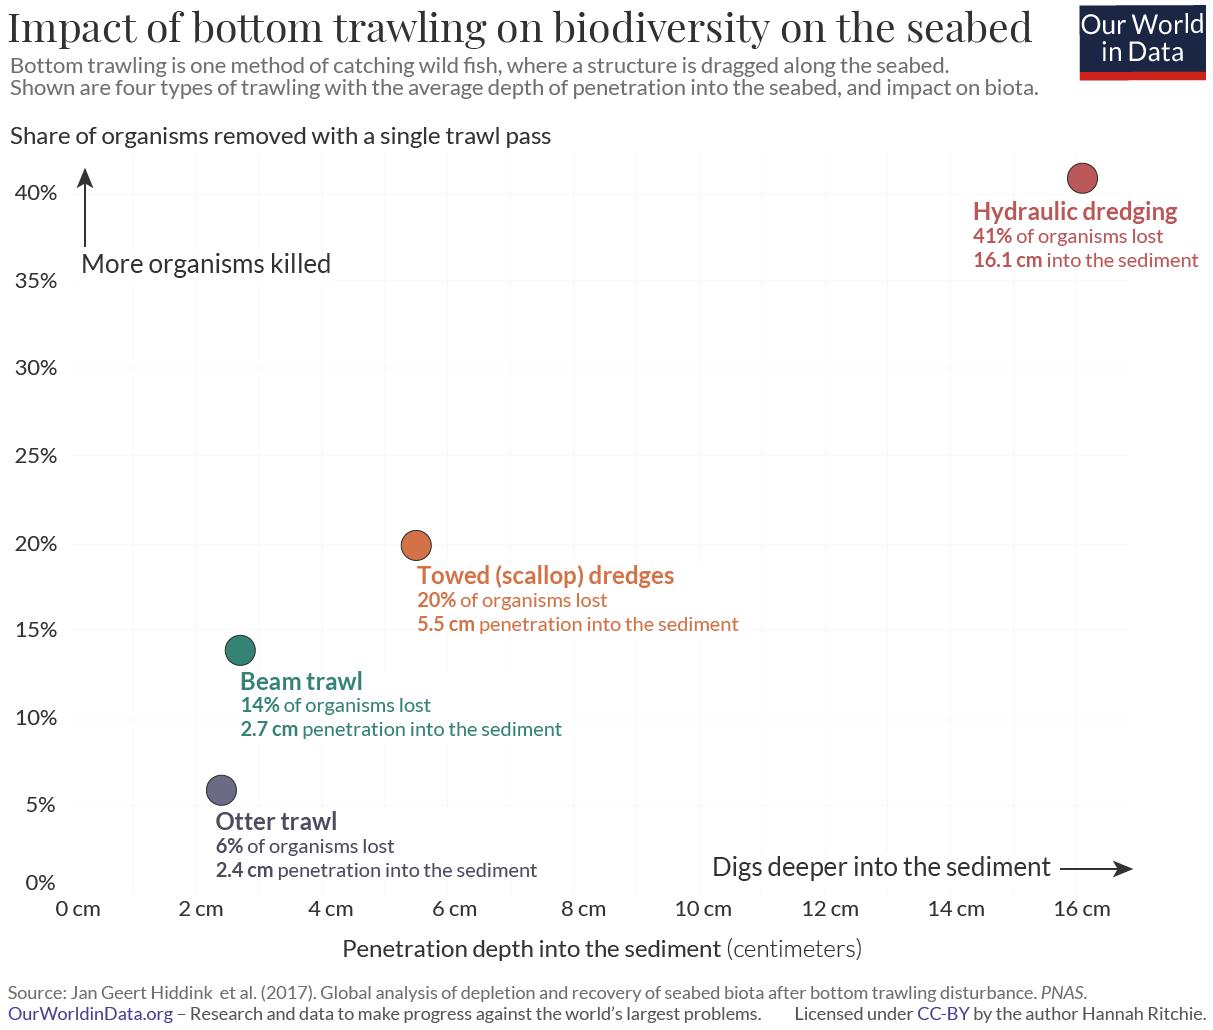 Impact of trawling on biota